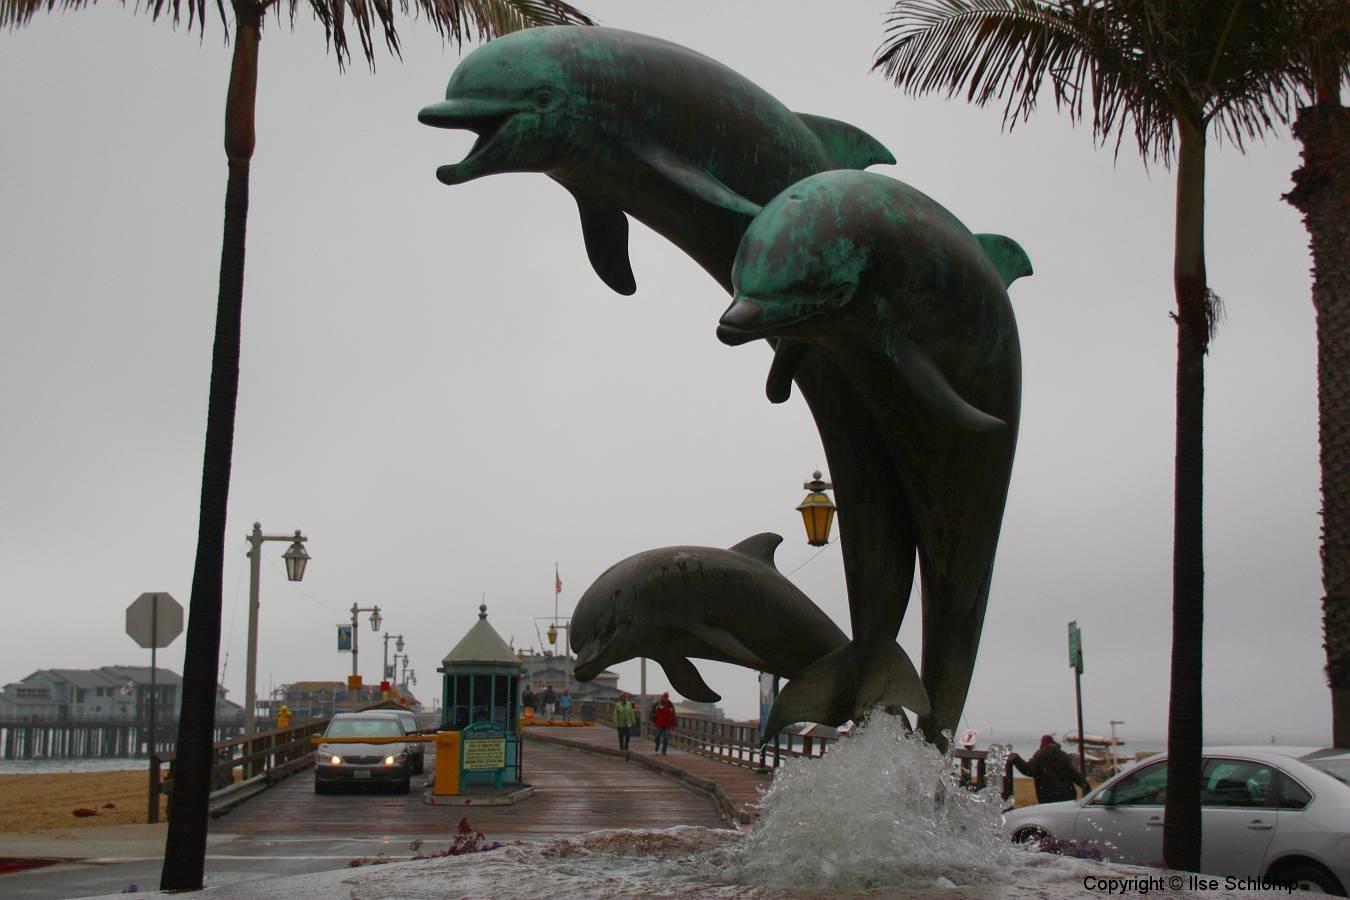 USA, Kalifornien, Santa Barbara, Stearns Wharf, Delphin-Brunnen